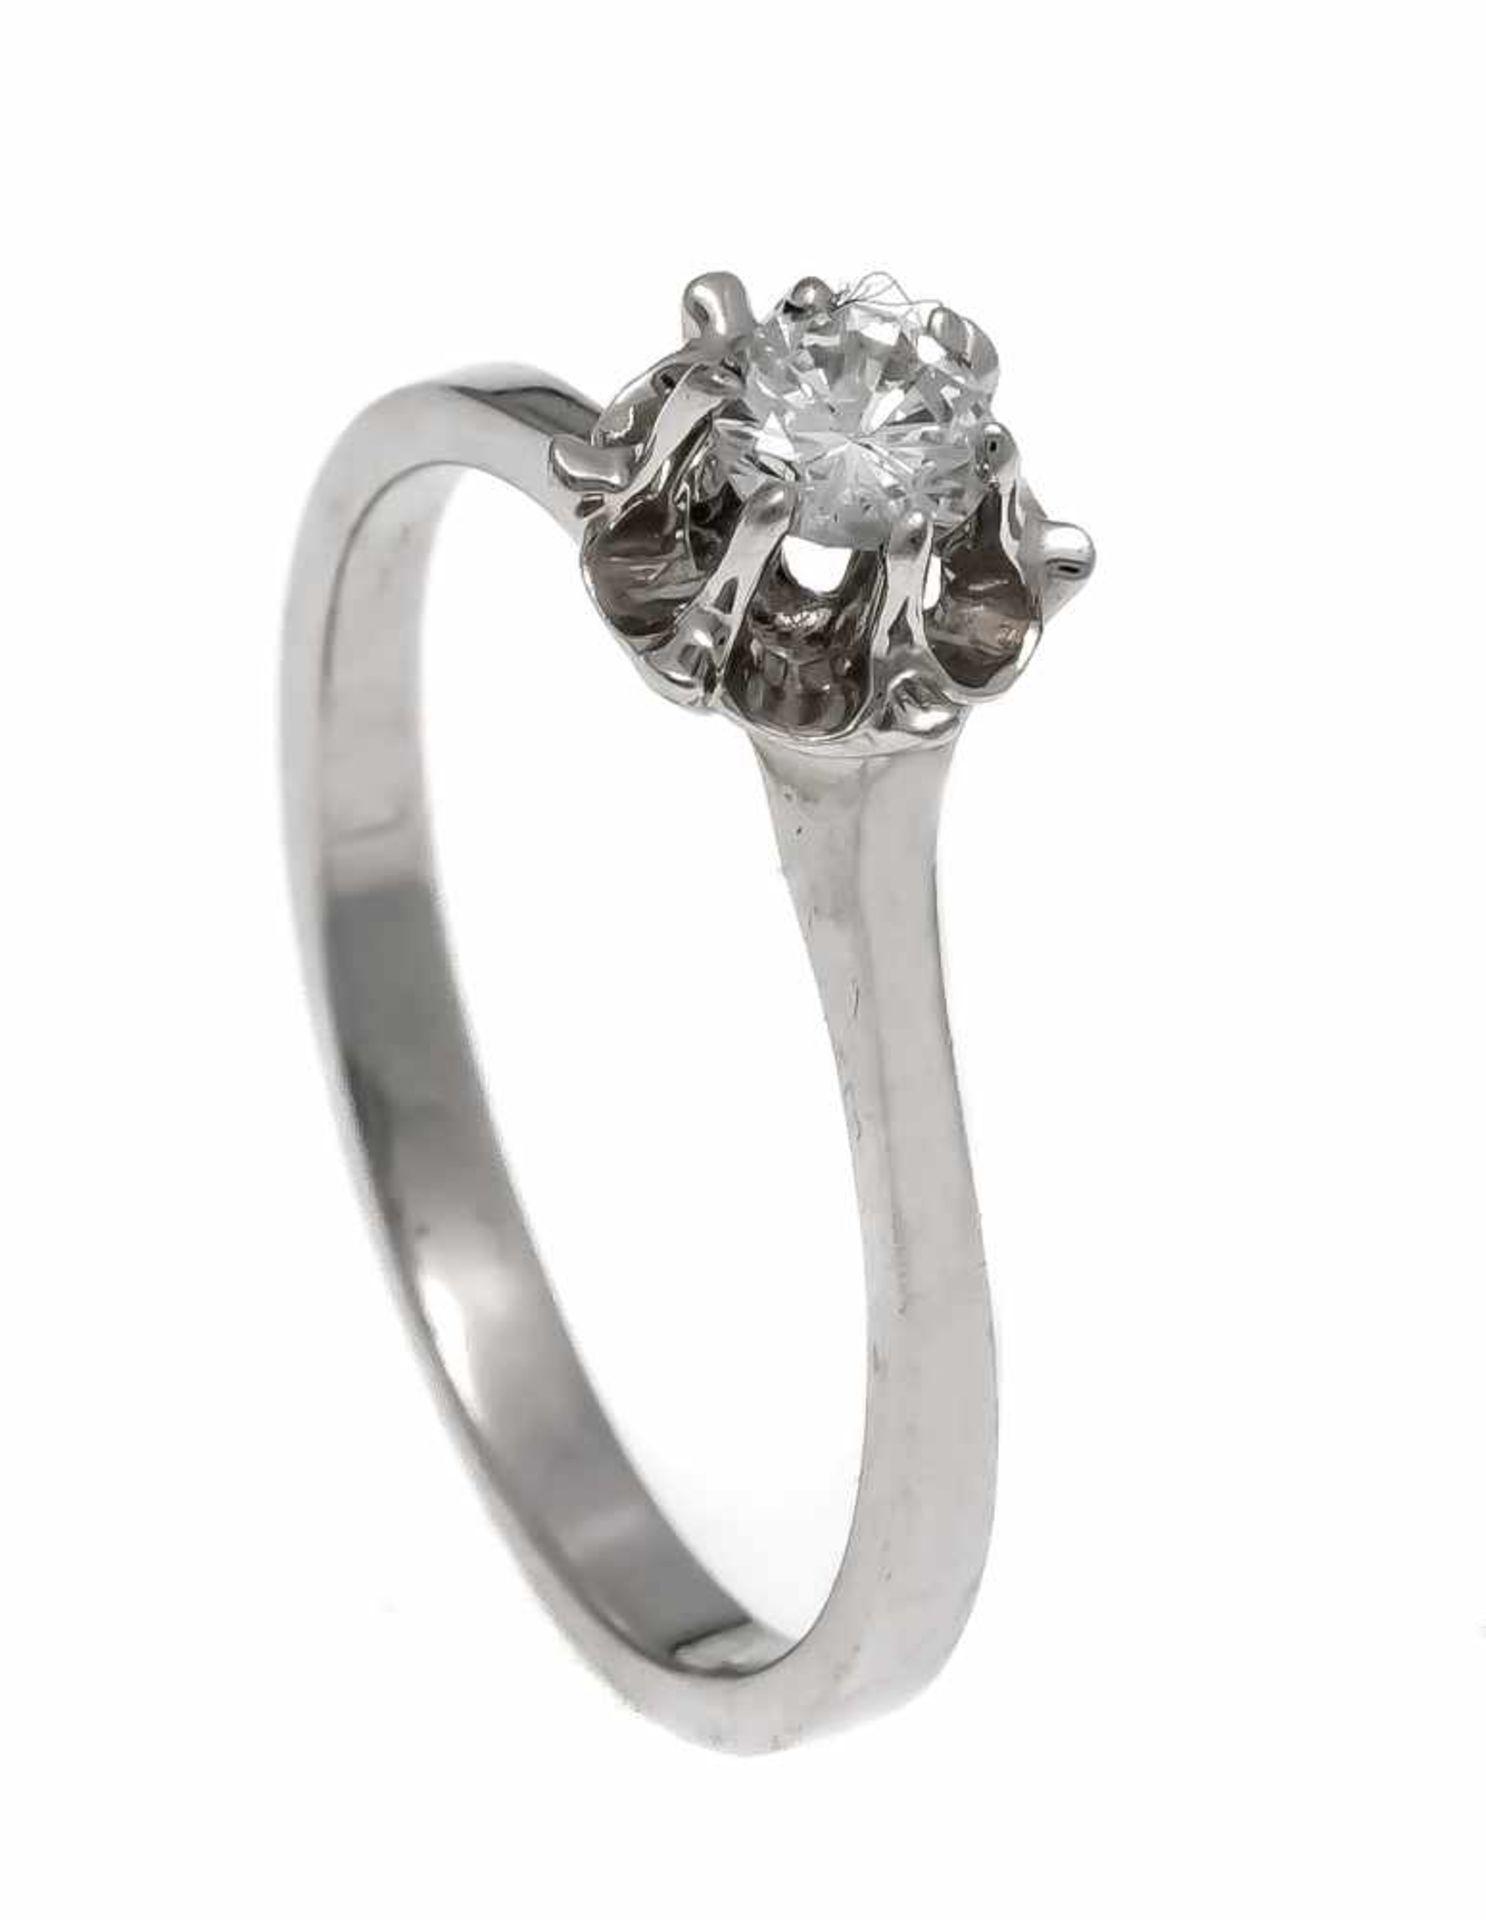 Brillant-Ring WG 585/000 mit einem Brillanten 0,25 ct W/SI, RG 56, 2,7 gDiamond ring WG 585 / 000